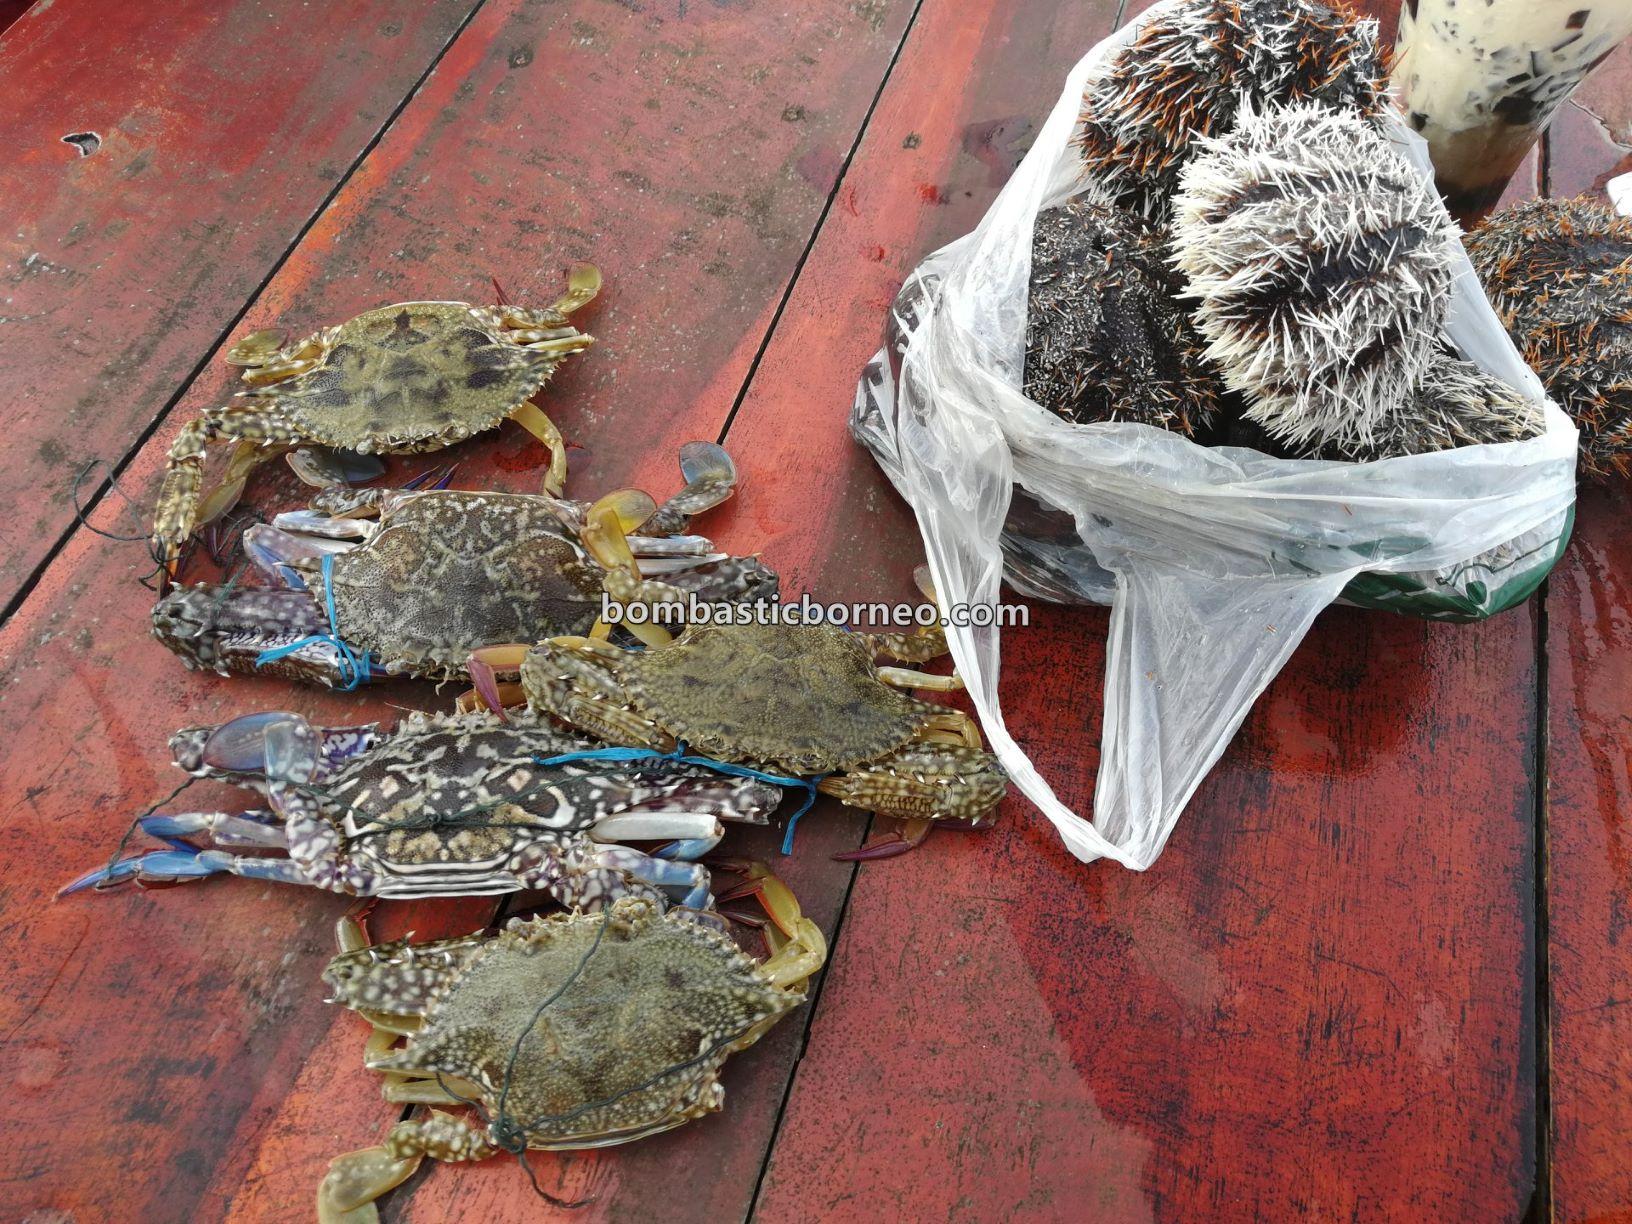 makanan laut, Pesta Regatta Lepa, backpackers, destination, nature, Tourism, tourist attraction, 穿越婆罗洲游踪, 马来西亚沙巴, 仙本那海鲜旅游景点